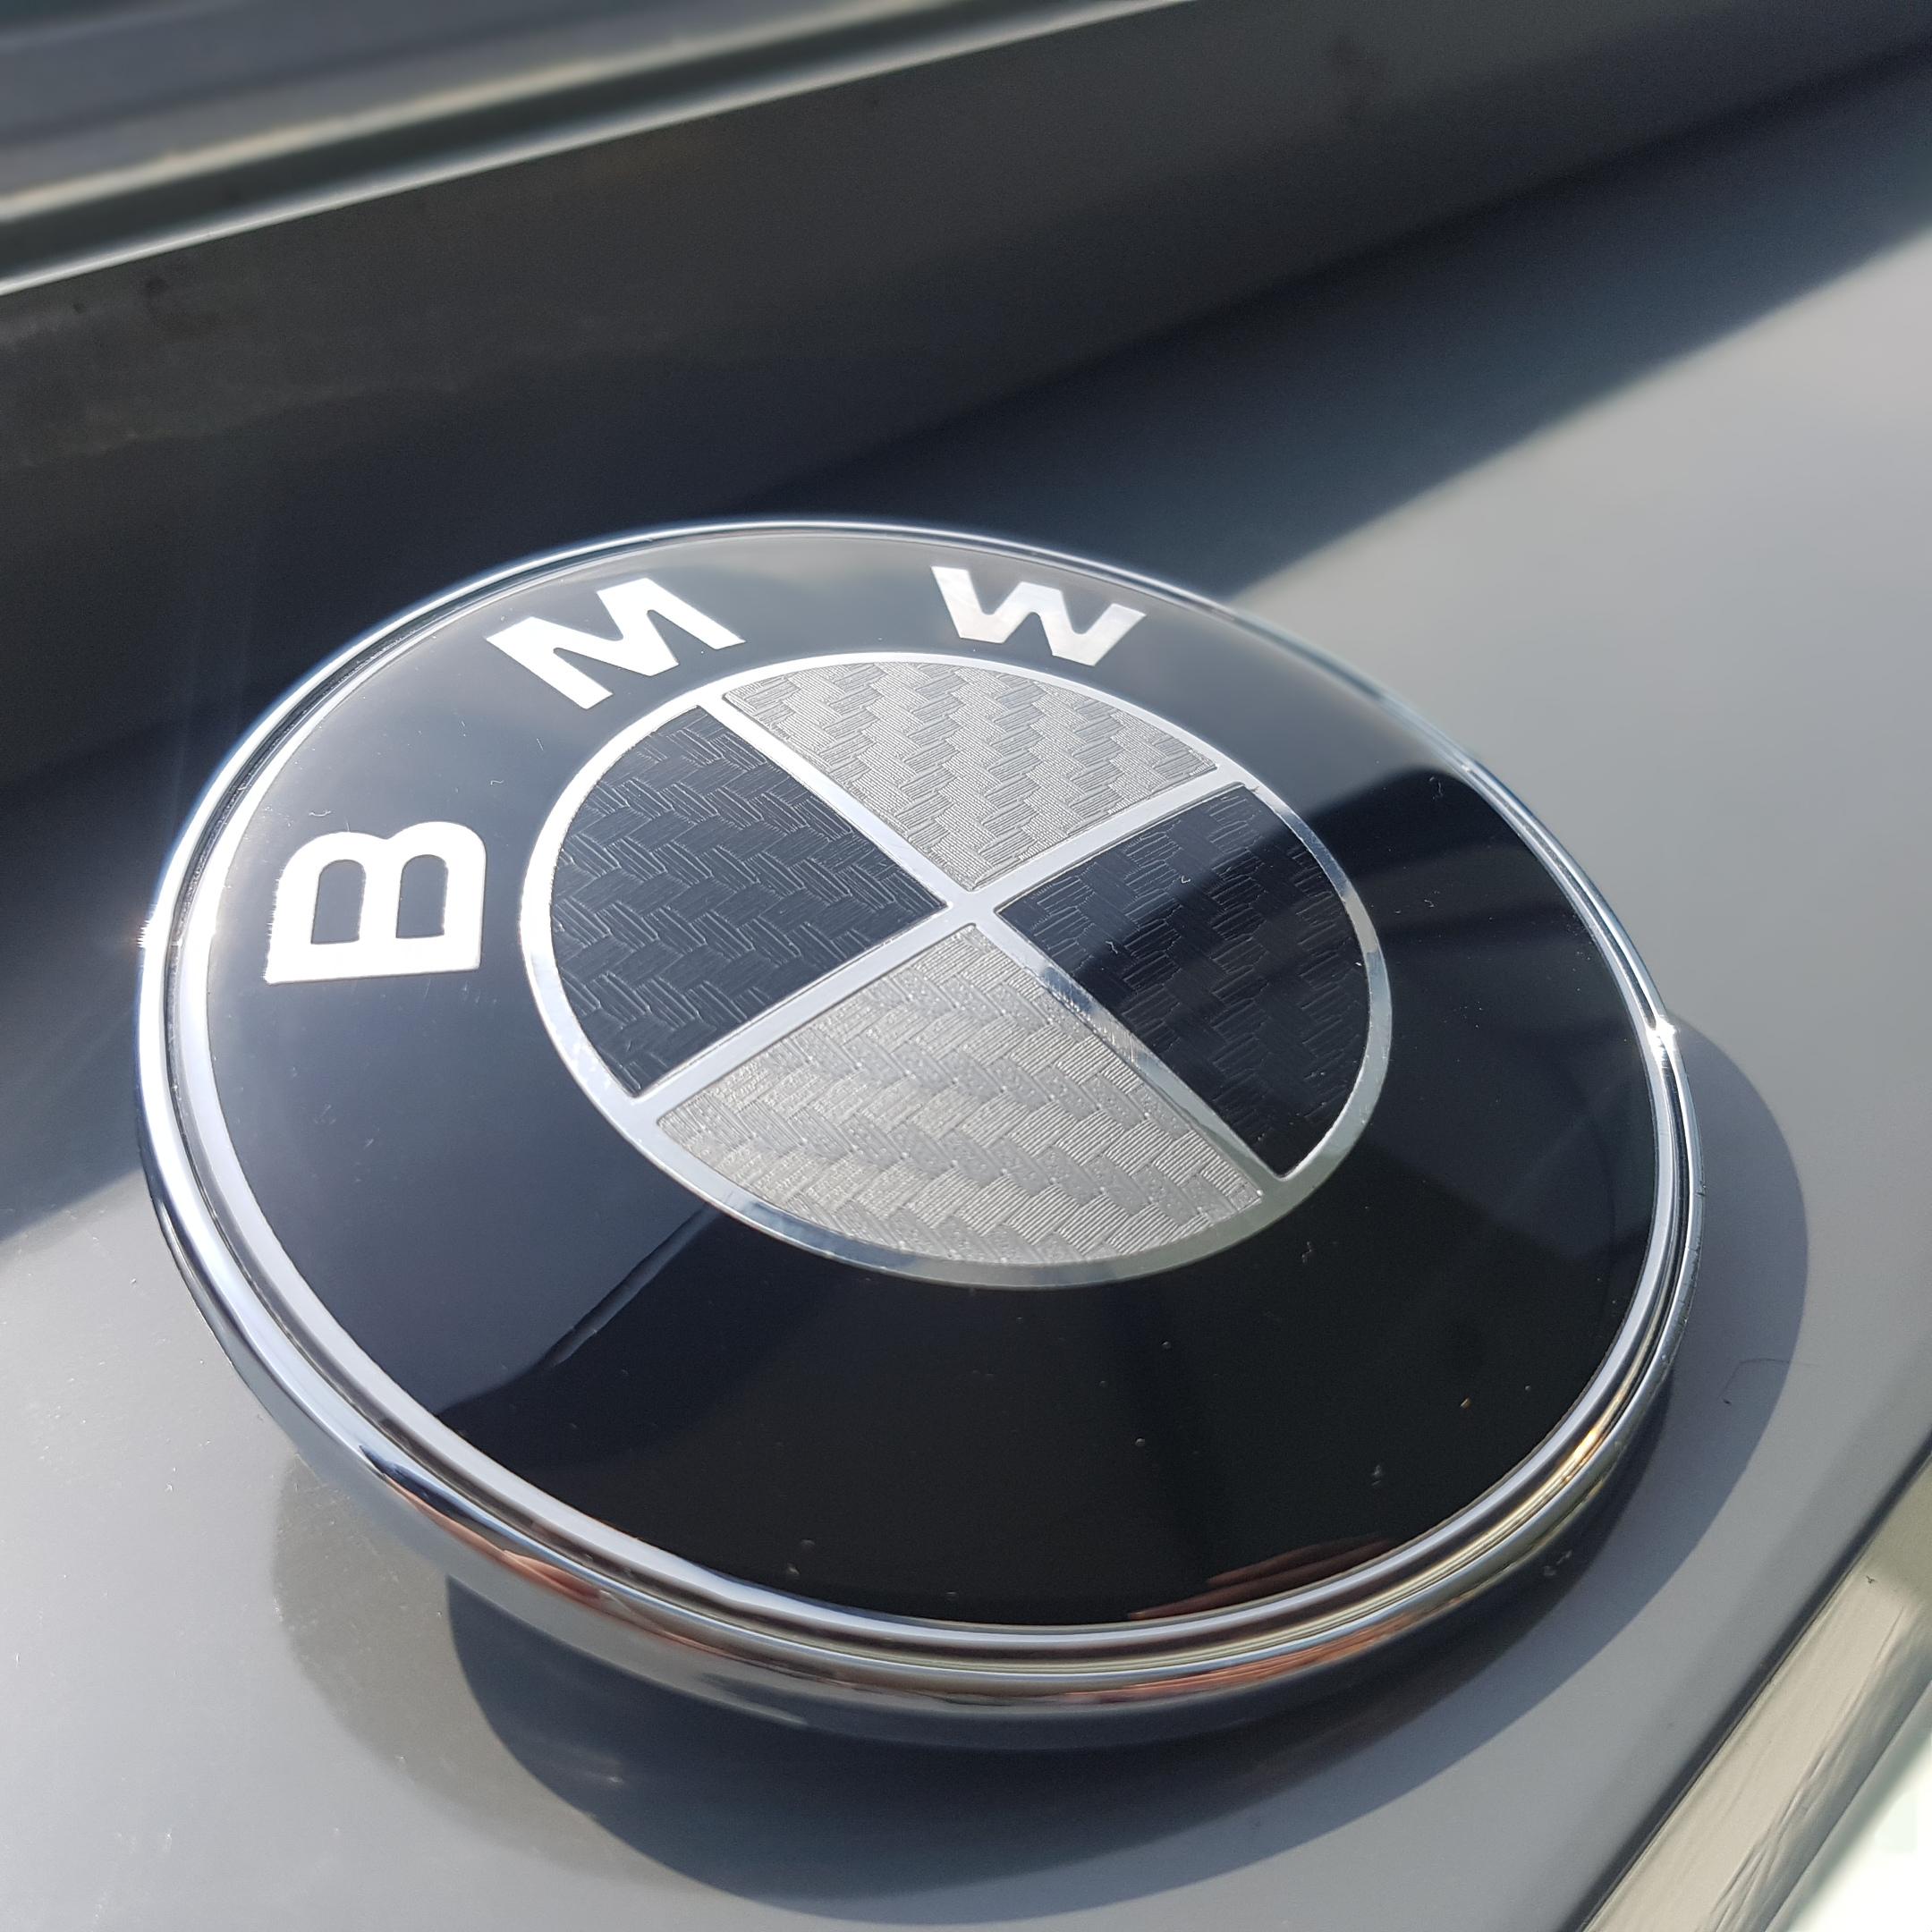 neu bmw carbon emblem 82mm motorhaube logo e39 front. Black Bedroom Furniture Sets. Home Design Ideas